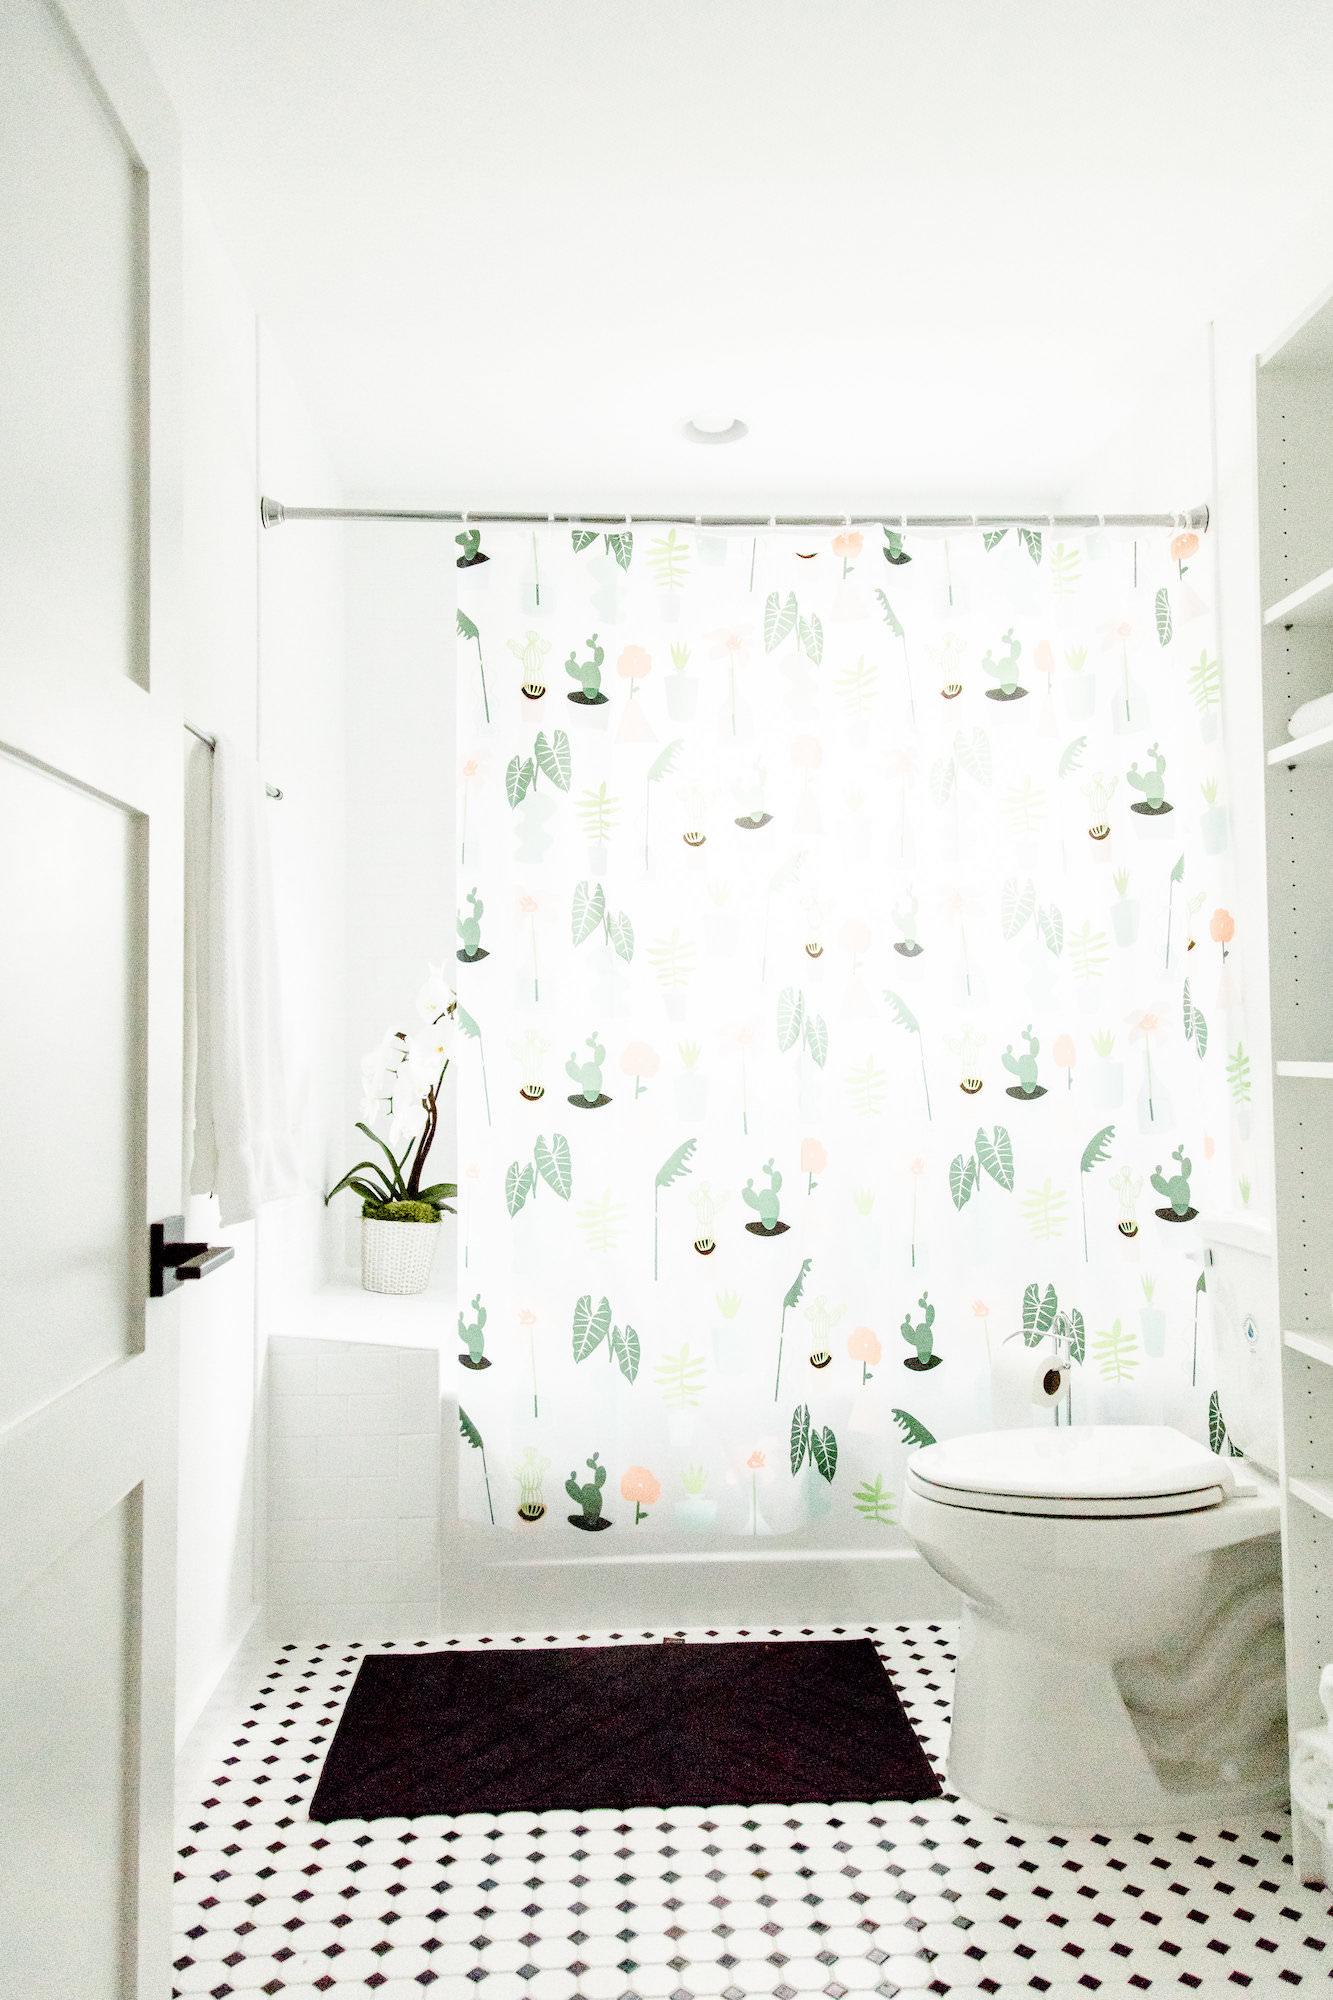 mid-century-modern-bathroom-white-plants-black-tile-web-resolution.jpg